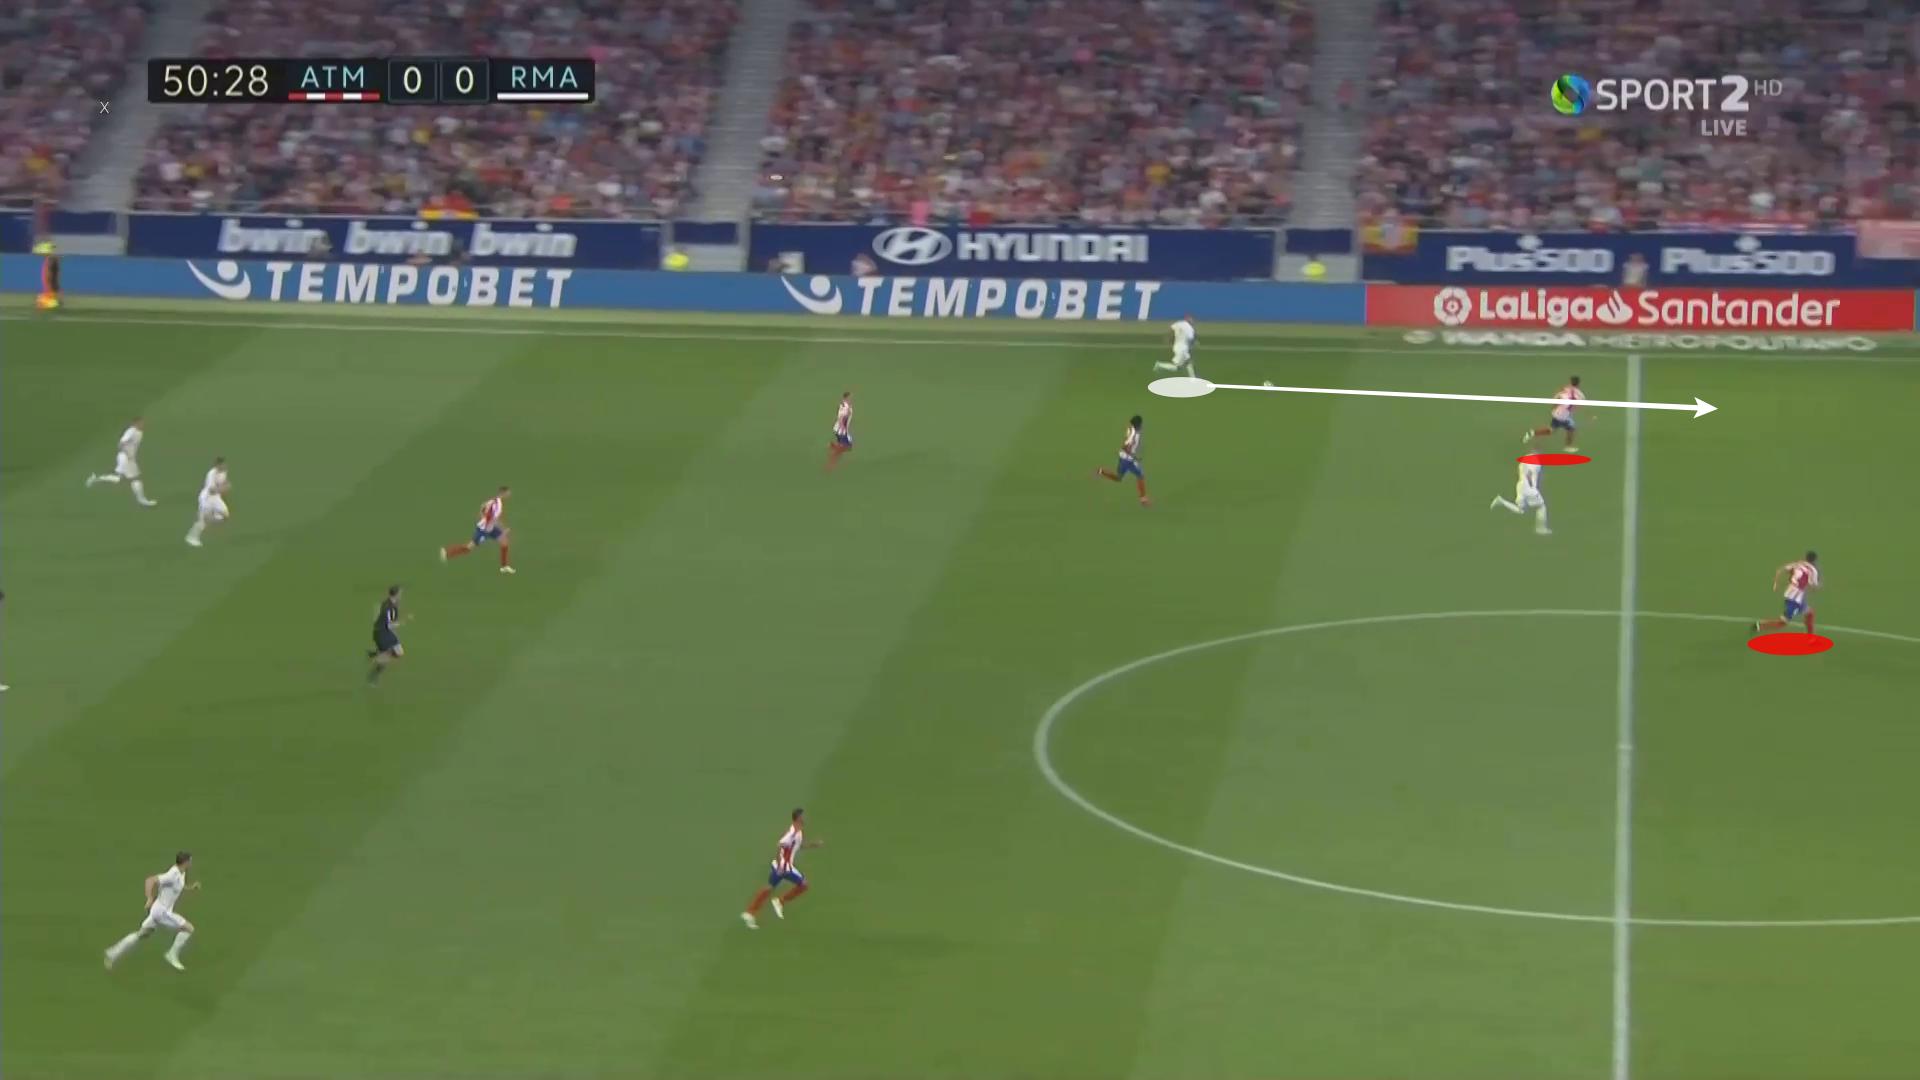 La Liga 2019/20: Atletico Madrid vs Real Madrid - tactical analysis tactics